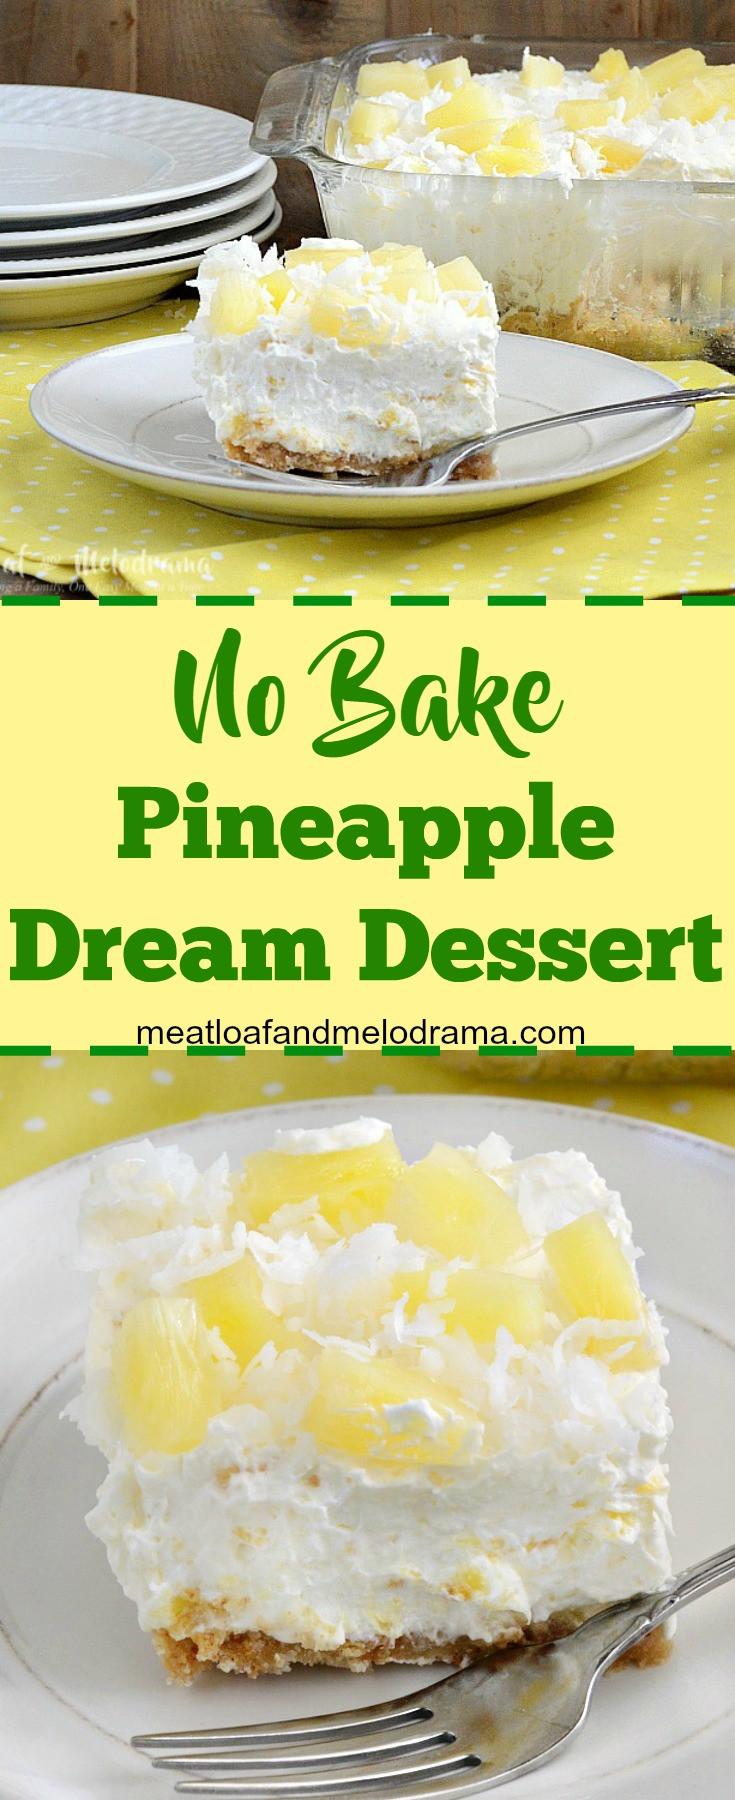 Easy Pineapple Desserts  easy pineapple dessert no bake